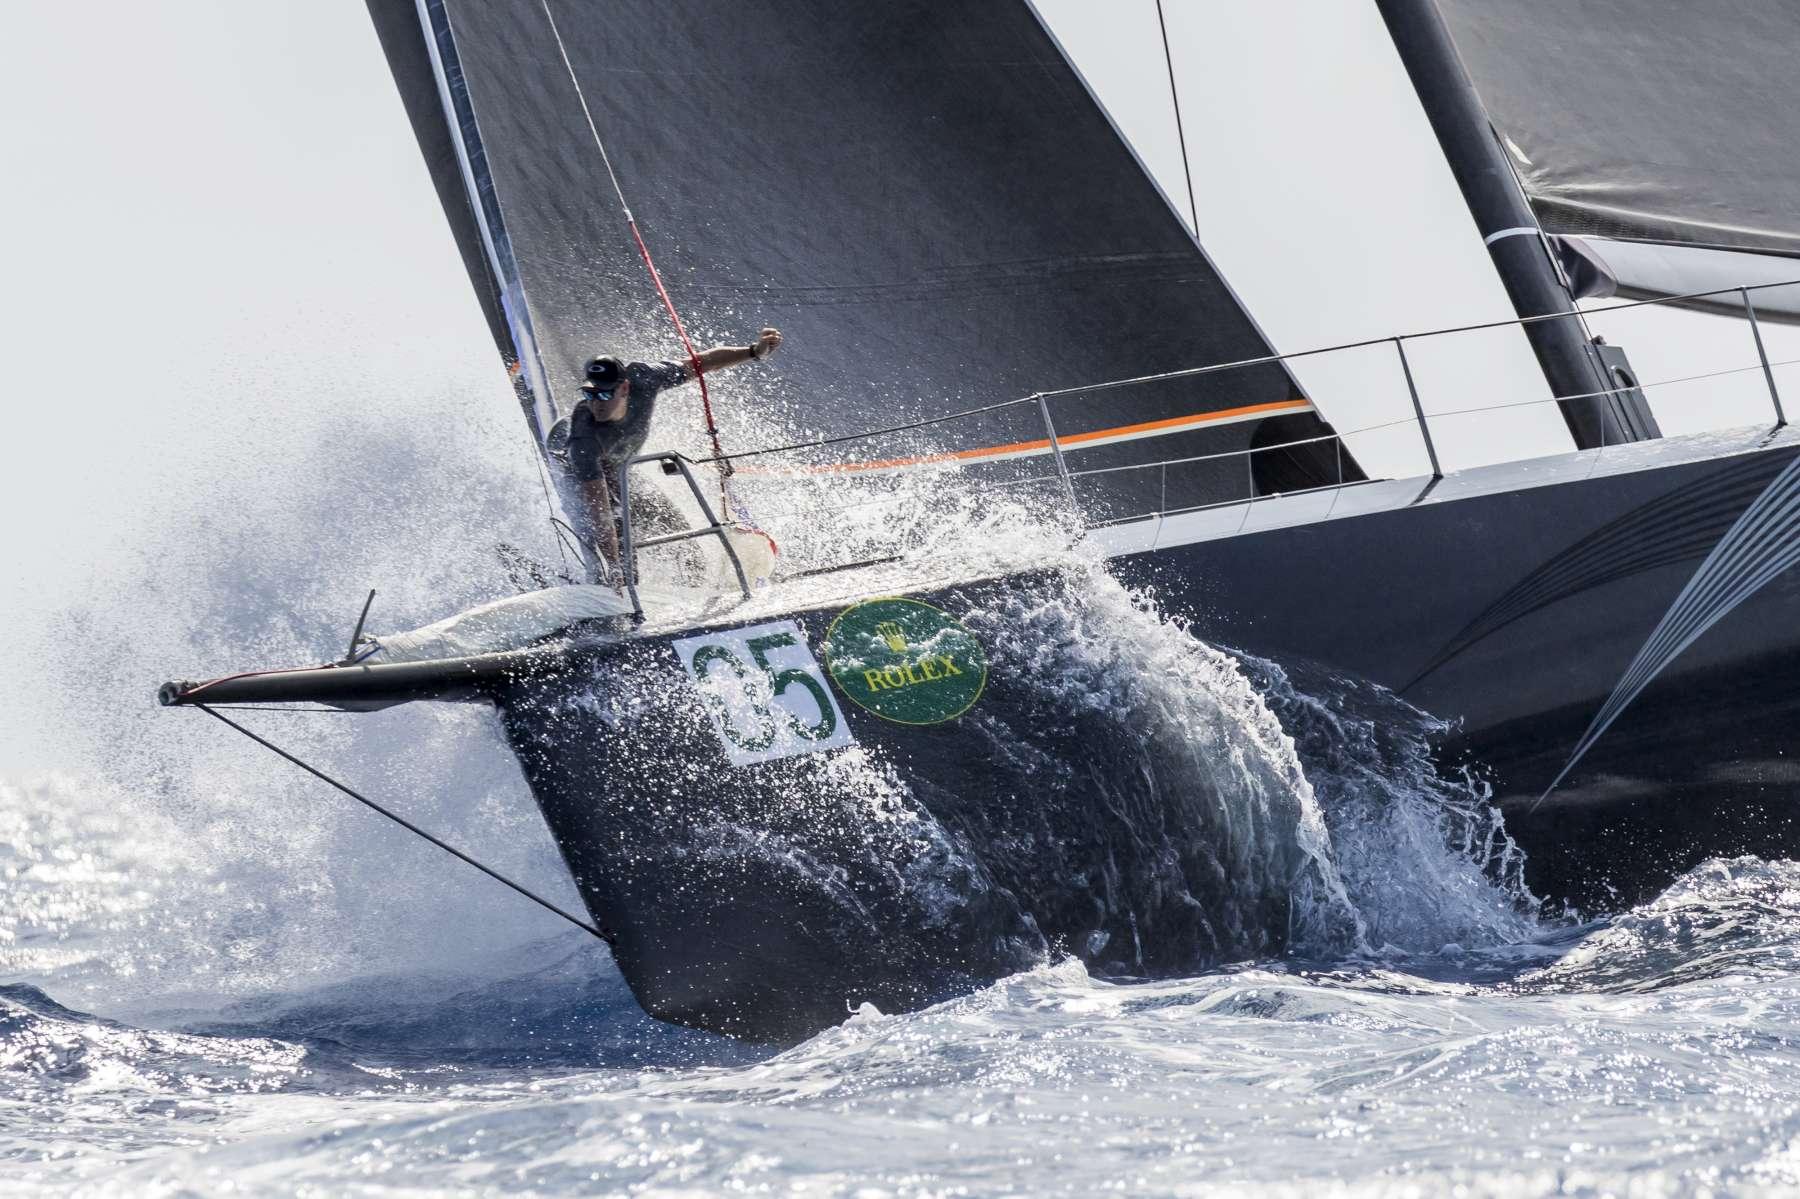 Maxi Yacht Rolex Cup & Rolex Maxi 72 Worlds - Foto Day 4 online - NEWS - Yacht Club Costa Smeralda